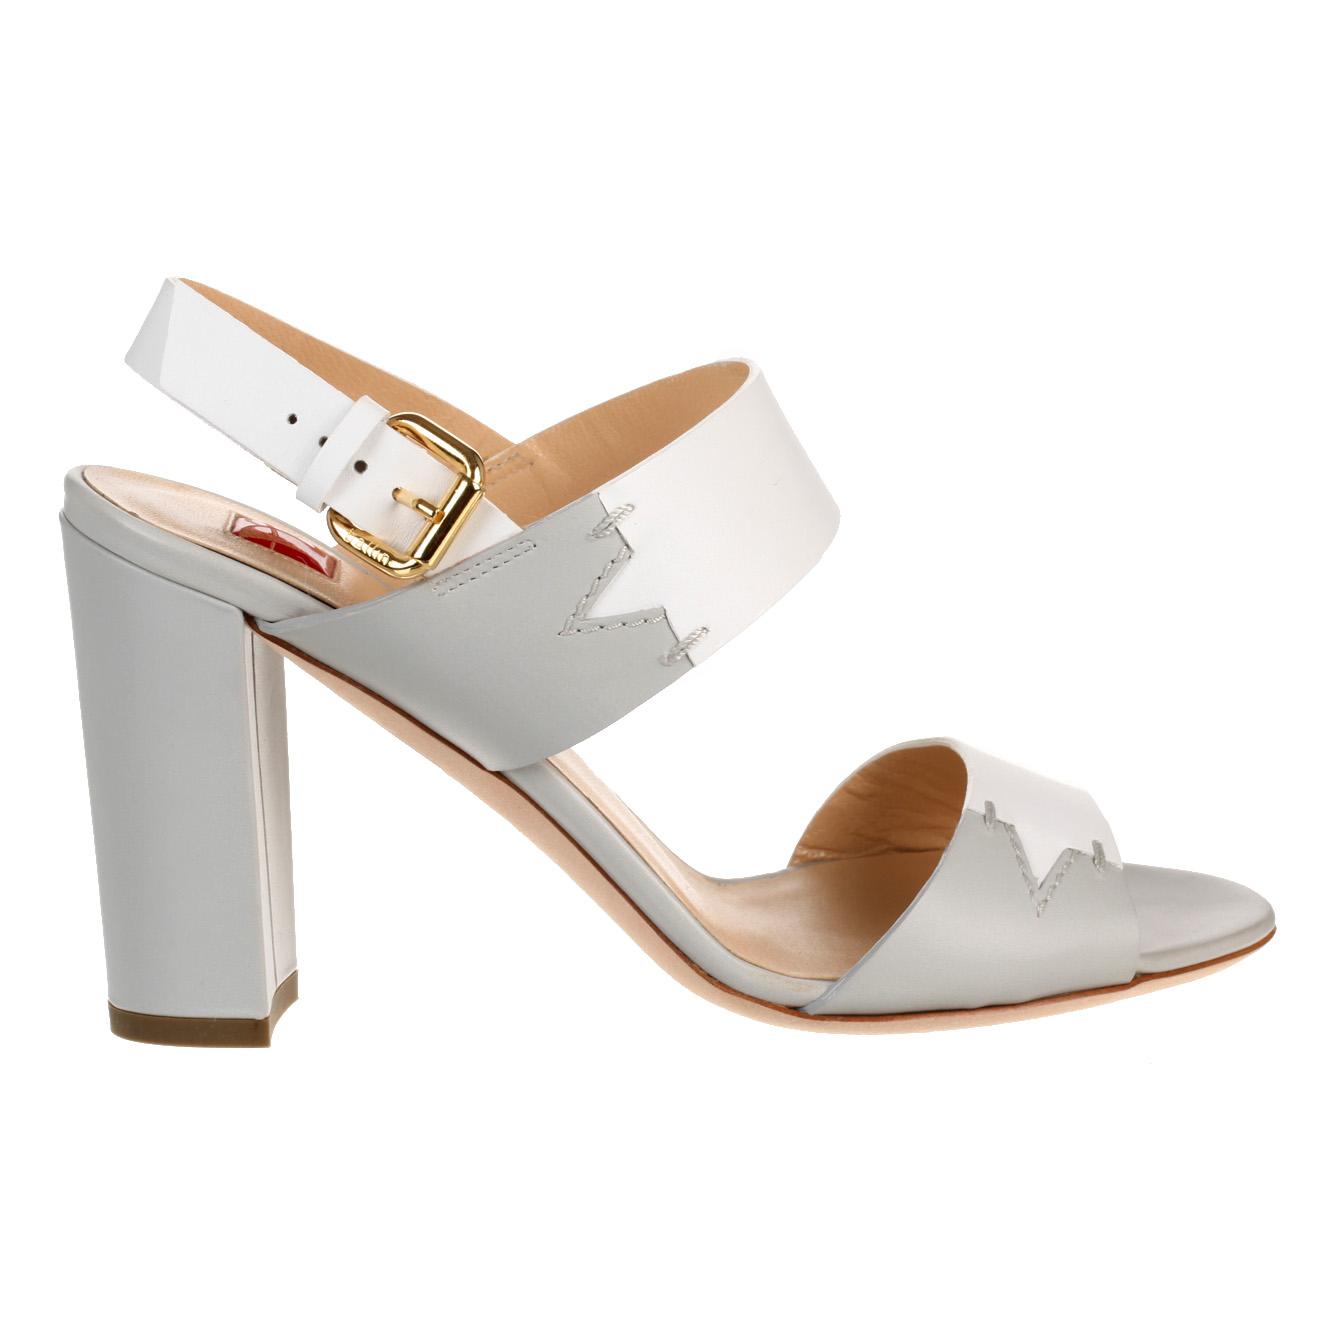 Sandales en Cuir blanc/gris - Talon 9 cm - Ballin - Modalova